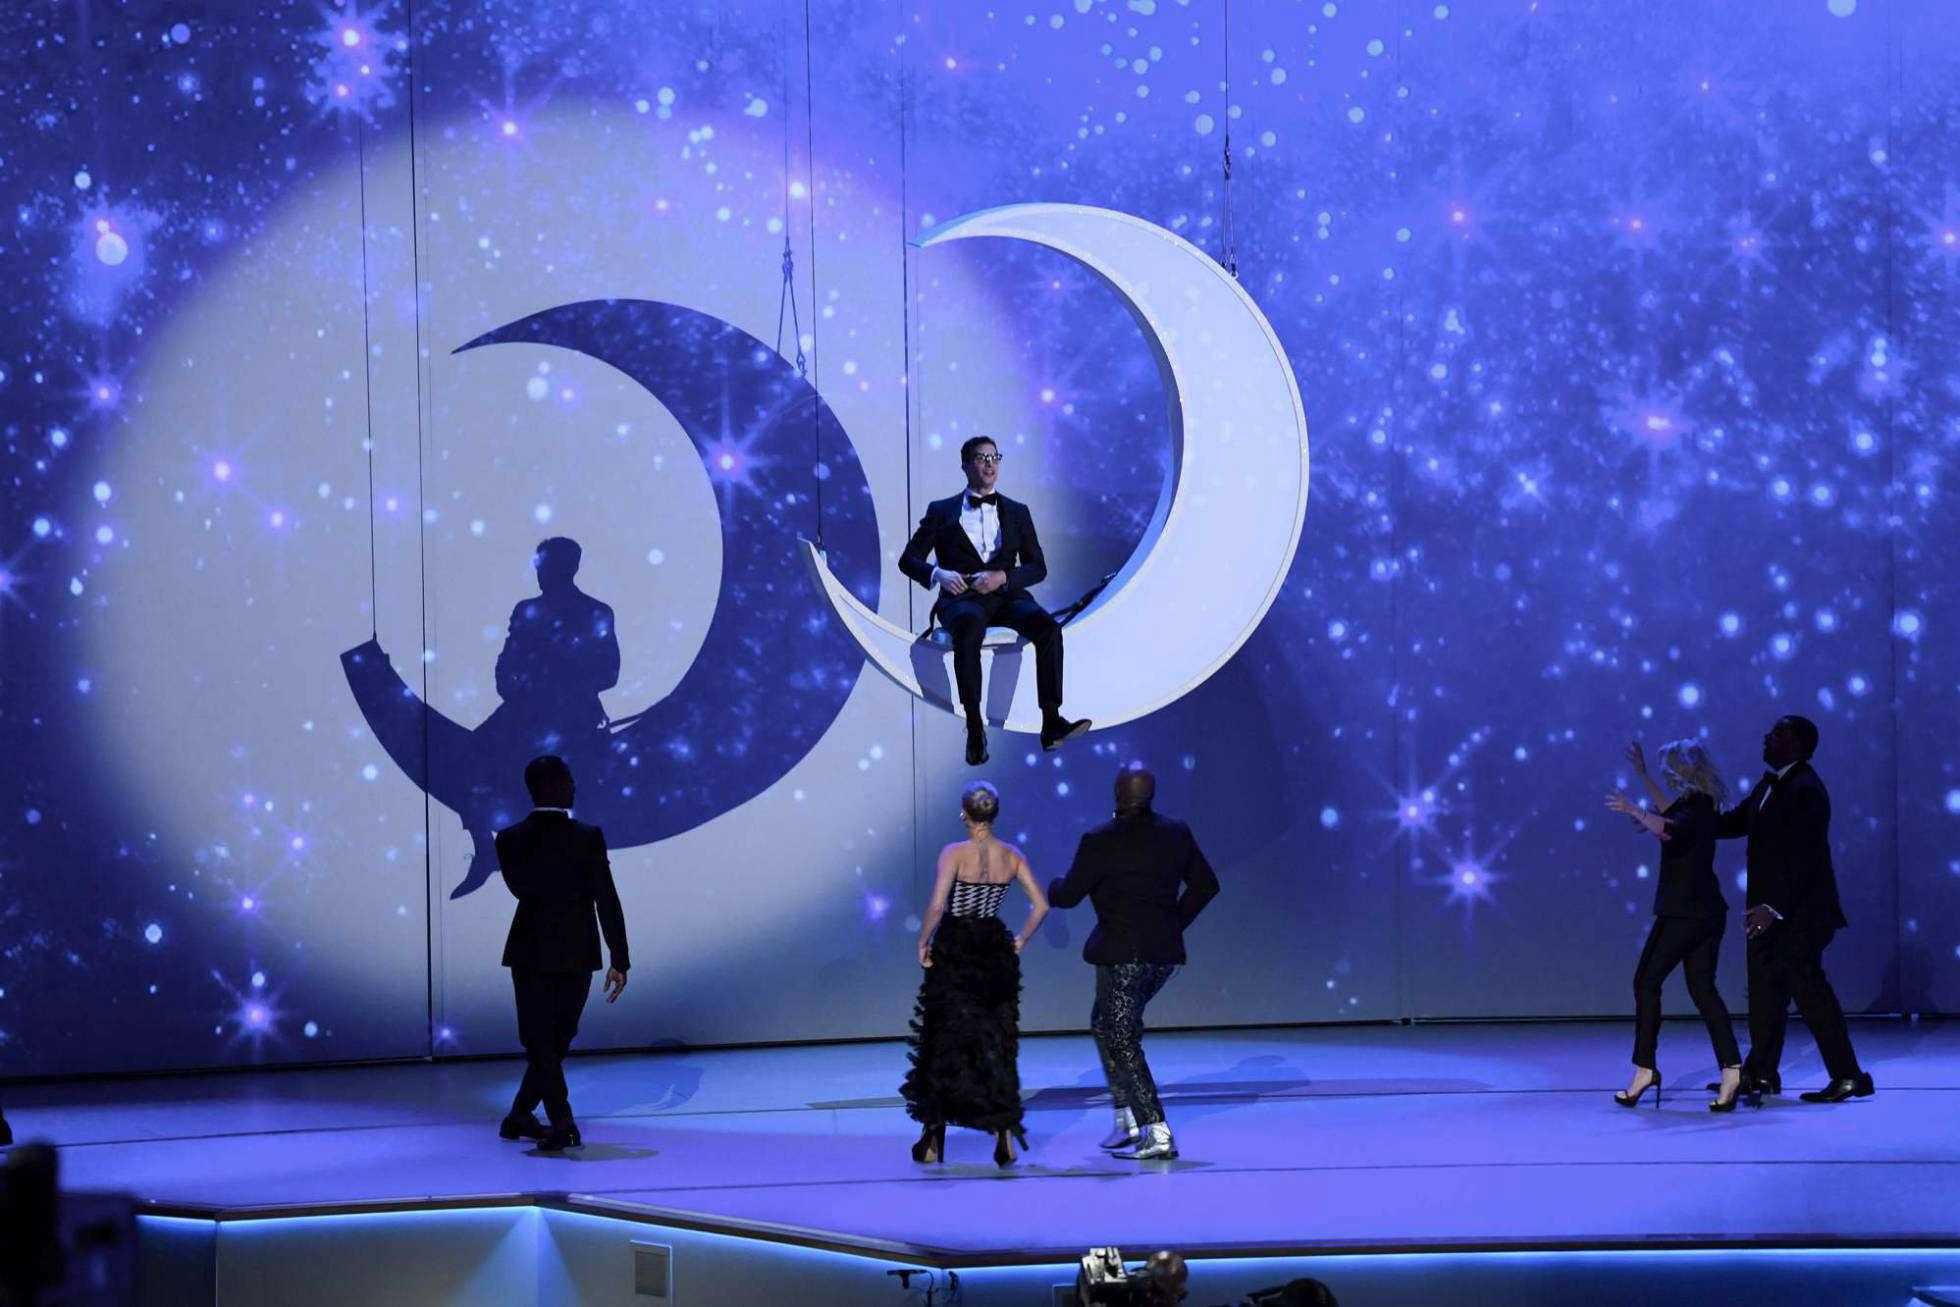 Premios-Emmys-03